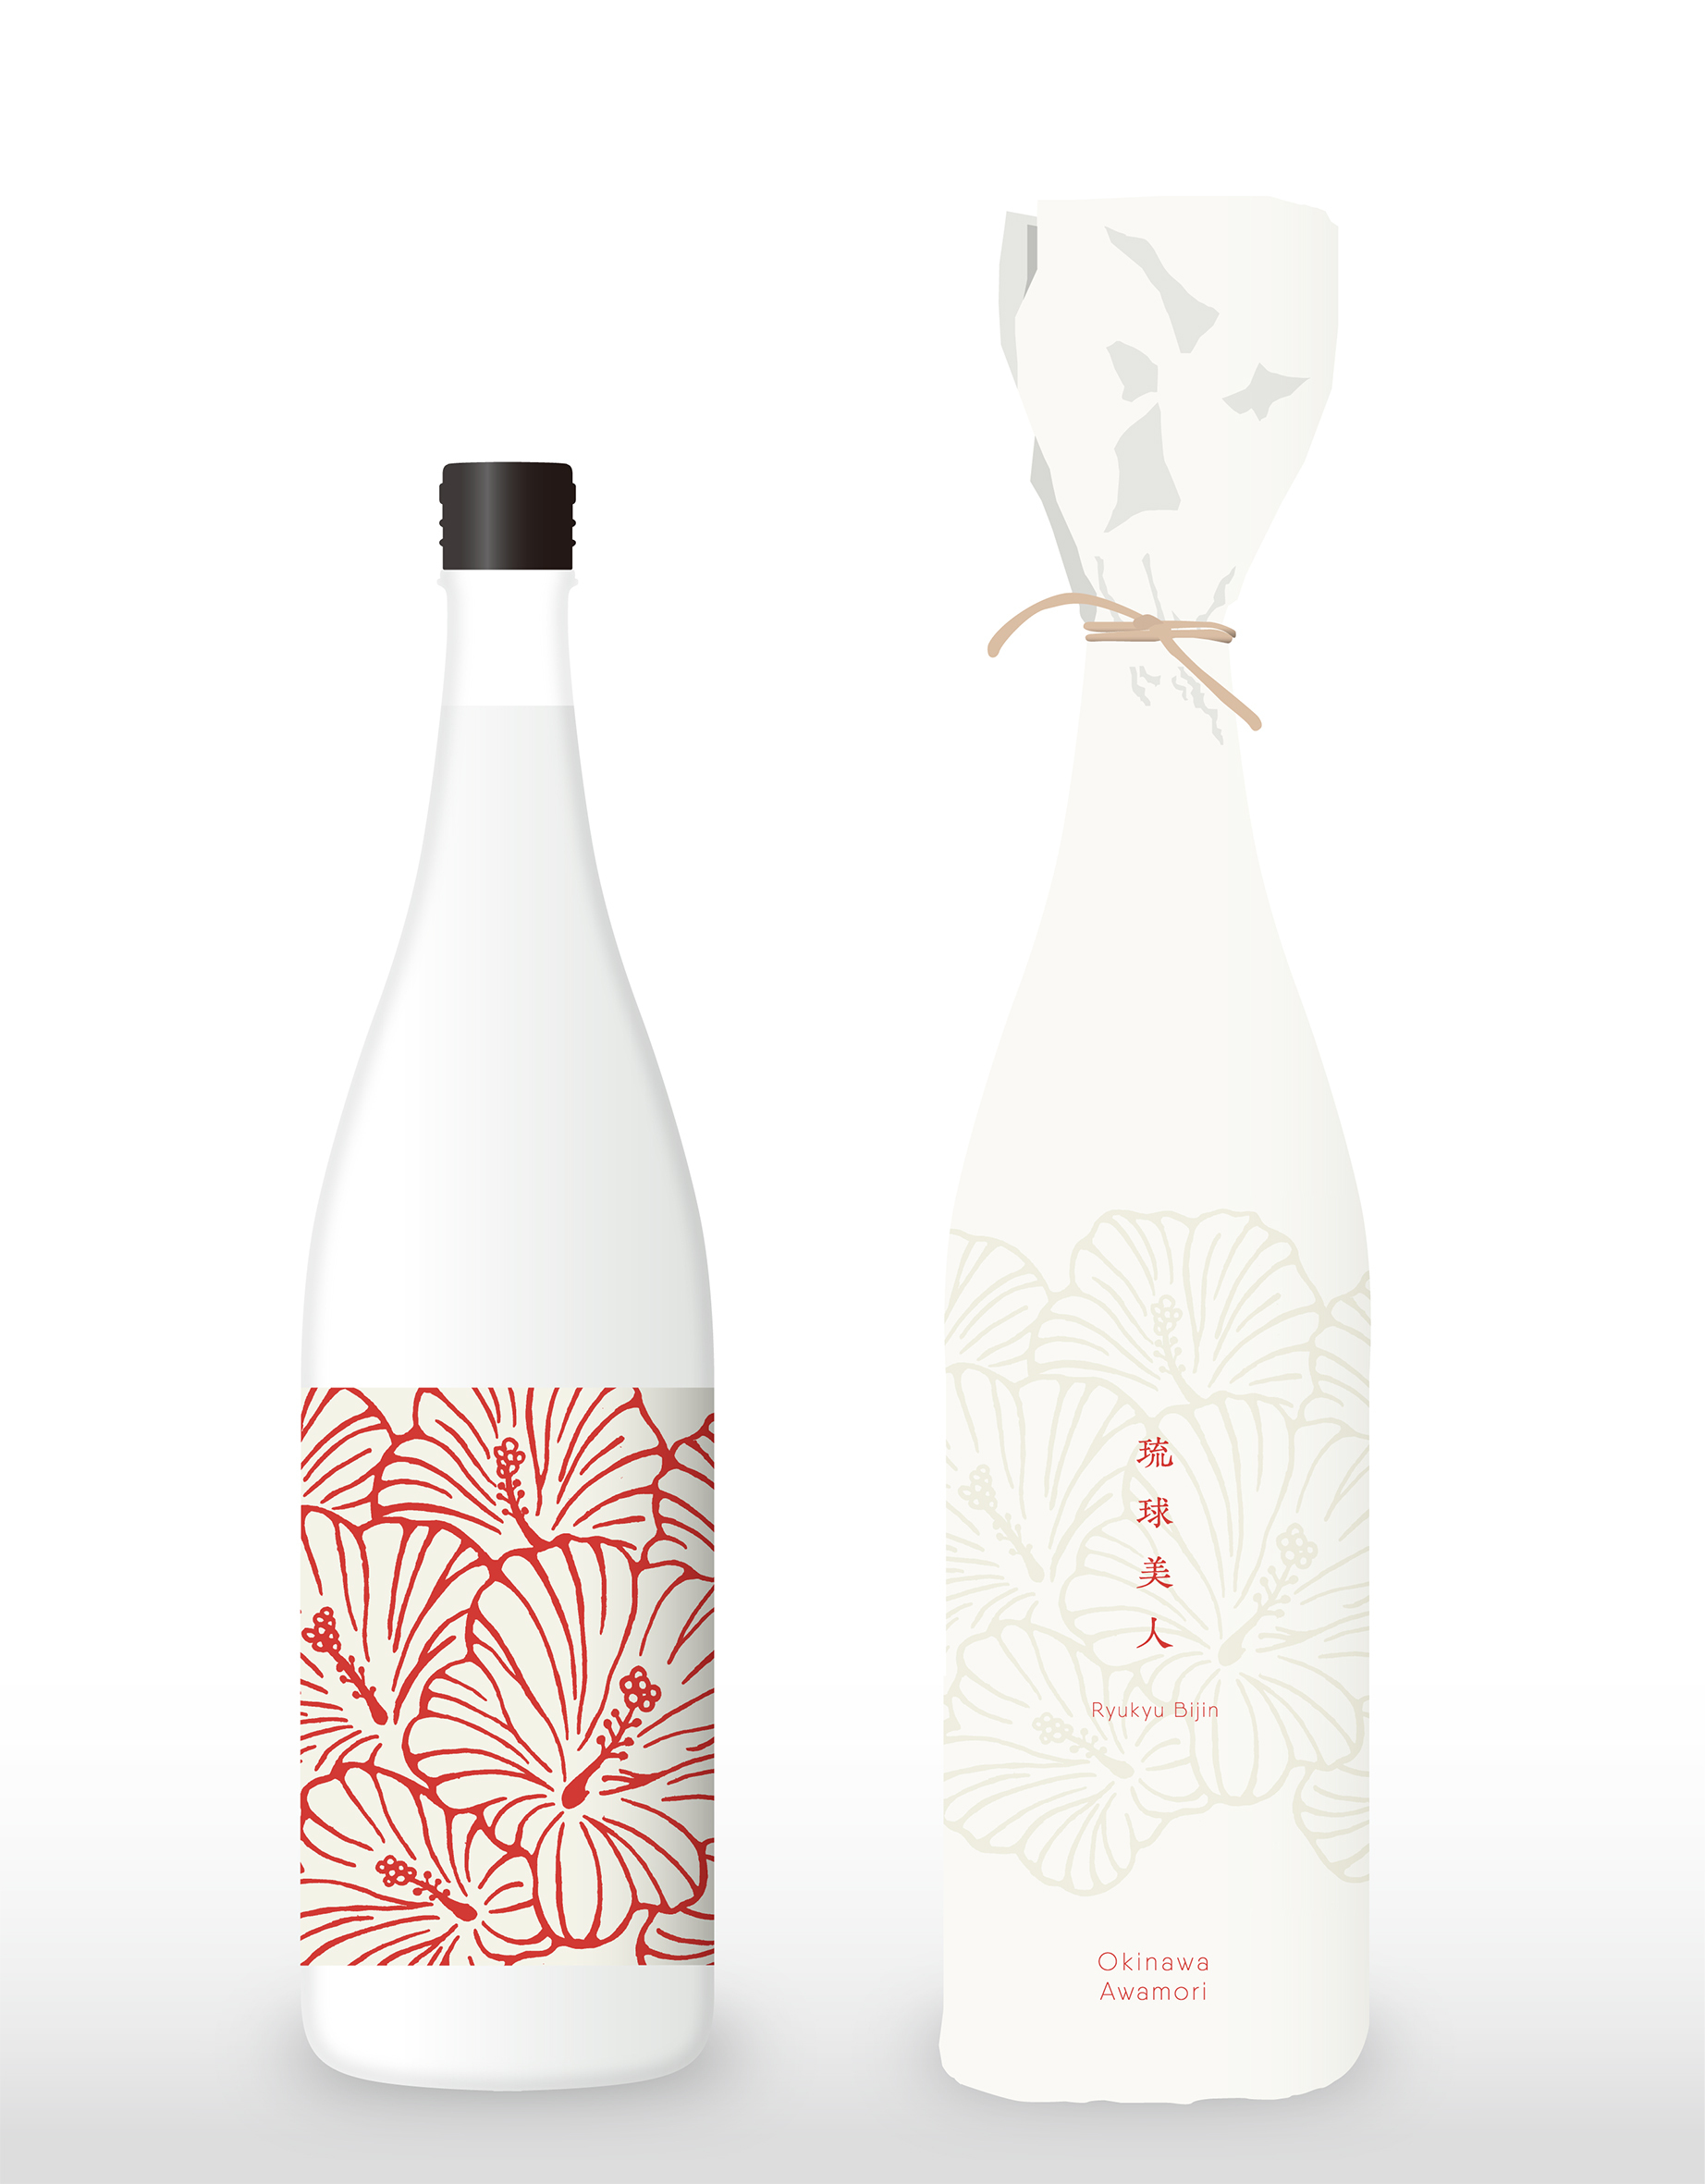 Helios Distillery: Launch Event for Ryukyu Awamori, Japan's Oldest Distilled Liquor